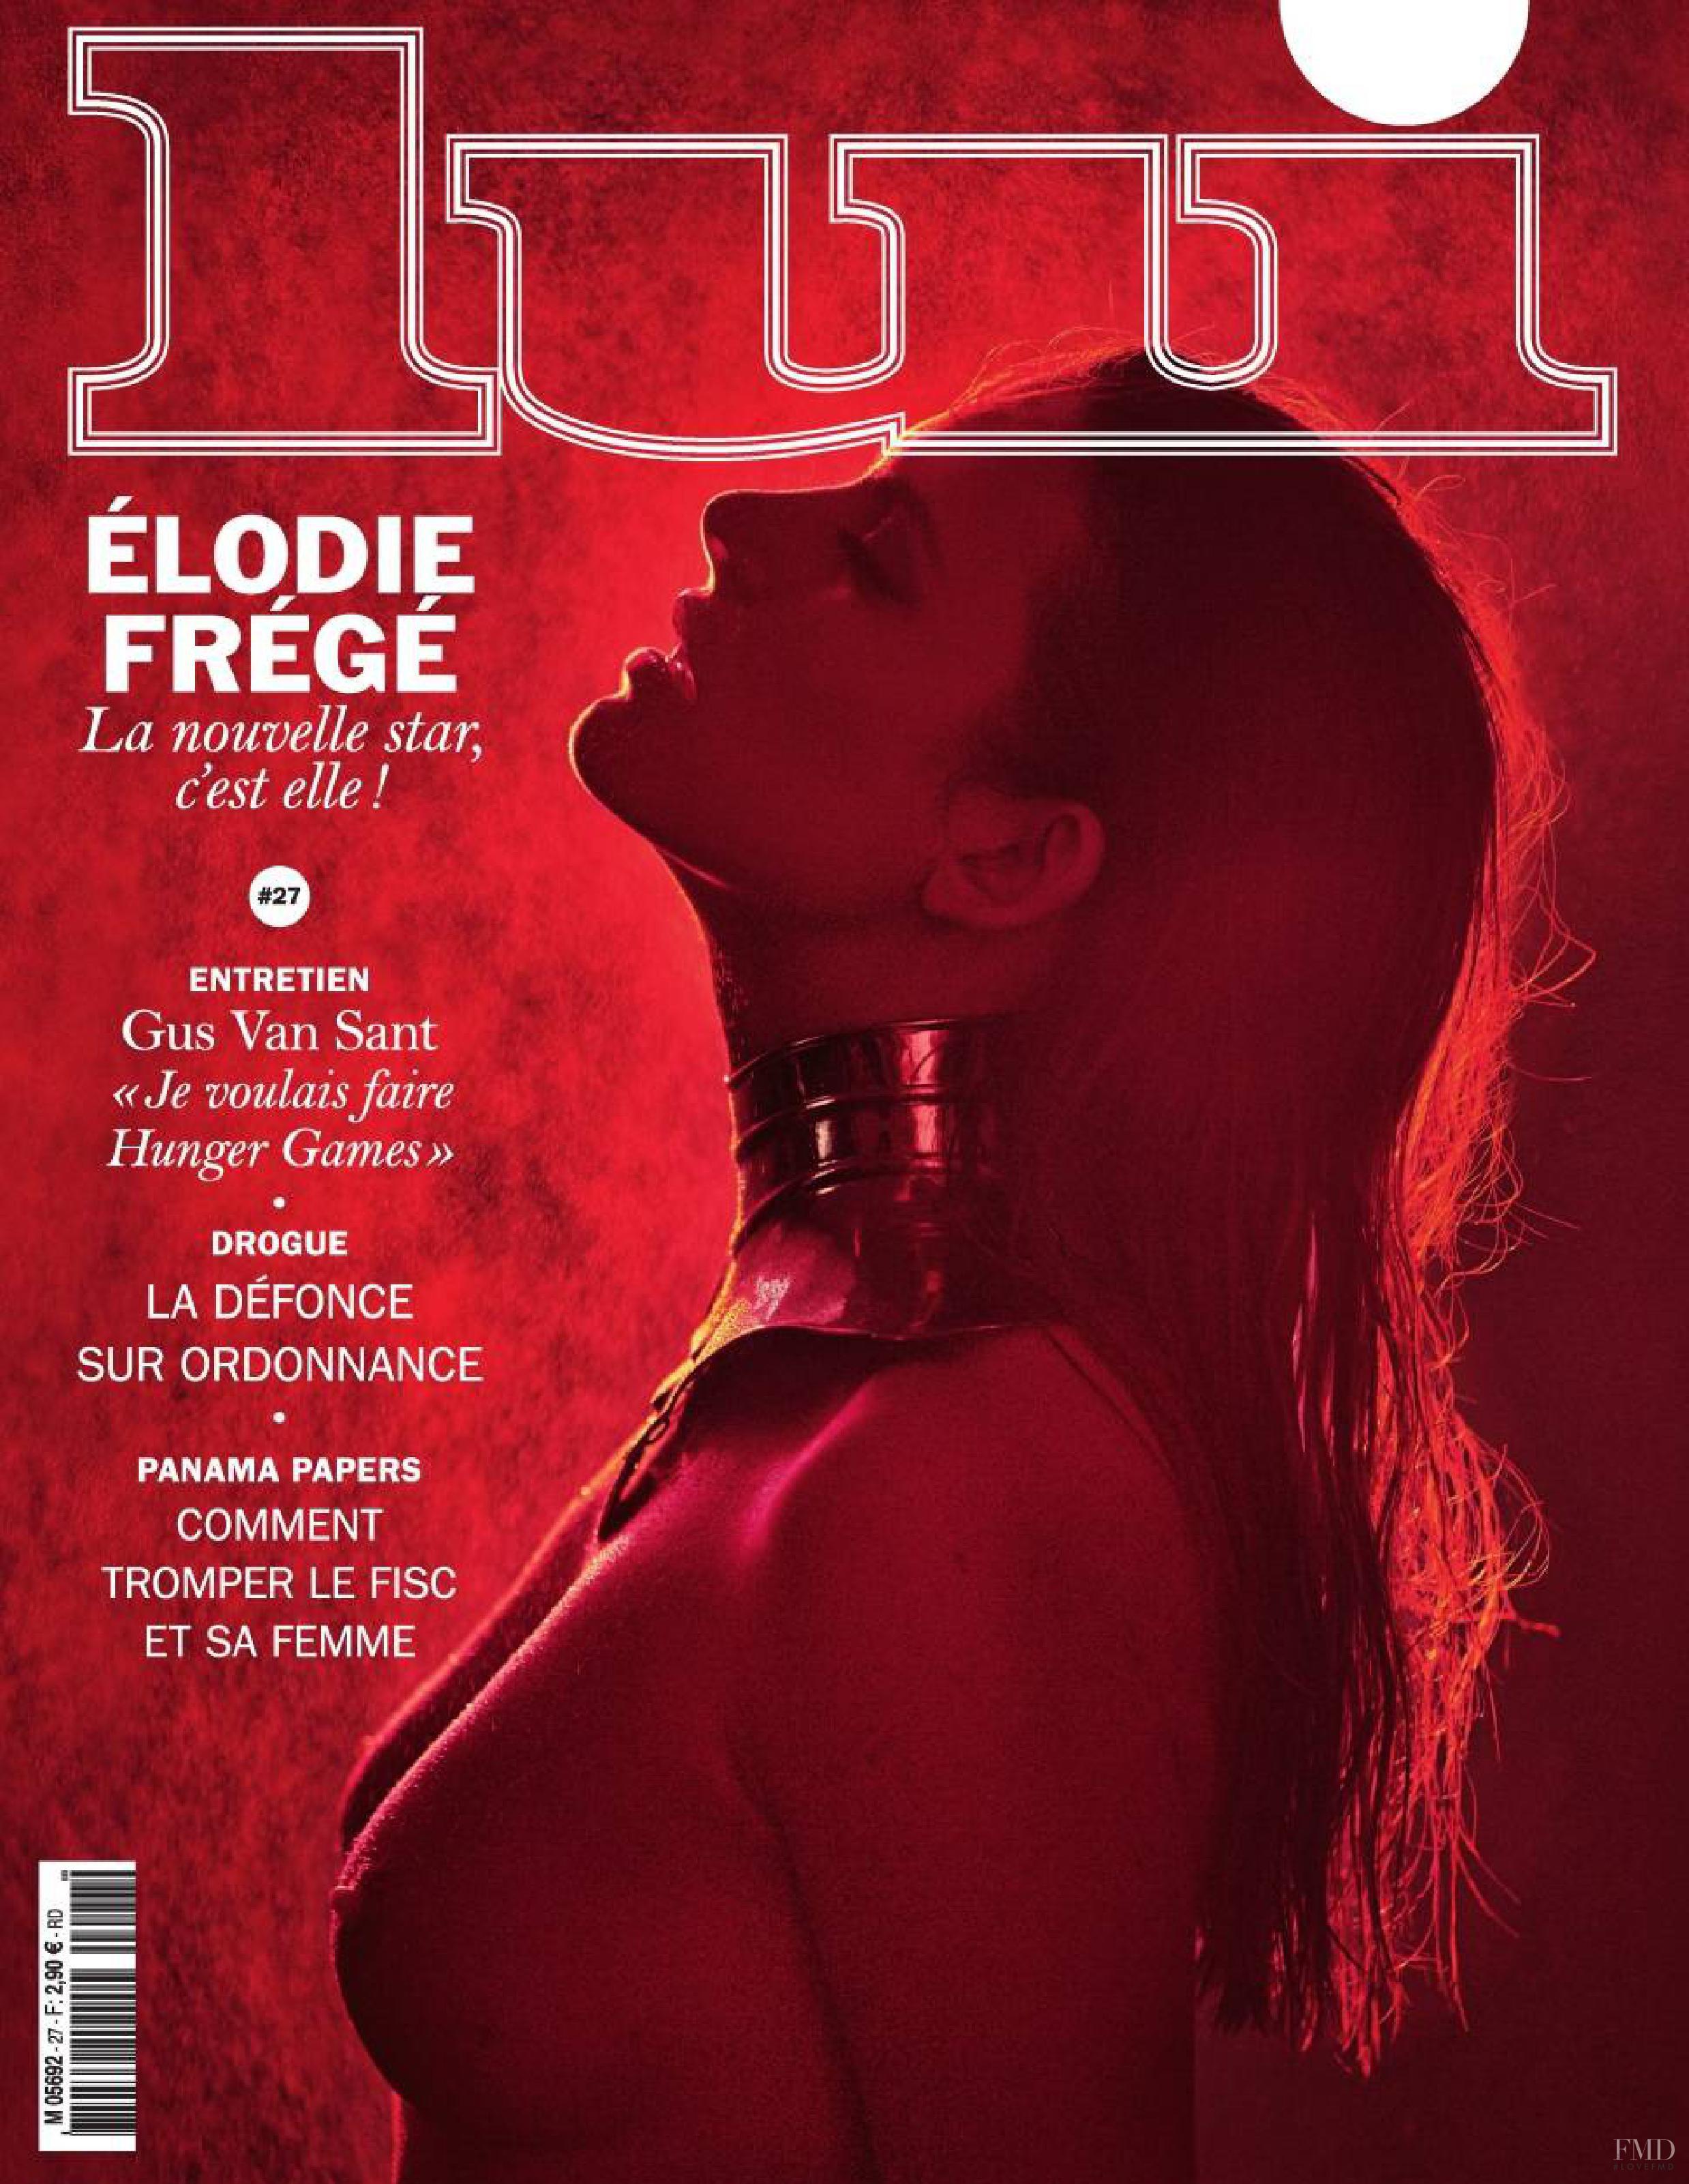 MALGOSIA BELA in Lui magazine, France February 2014 Issue